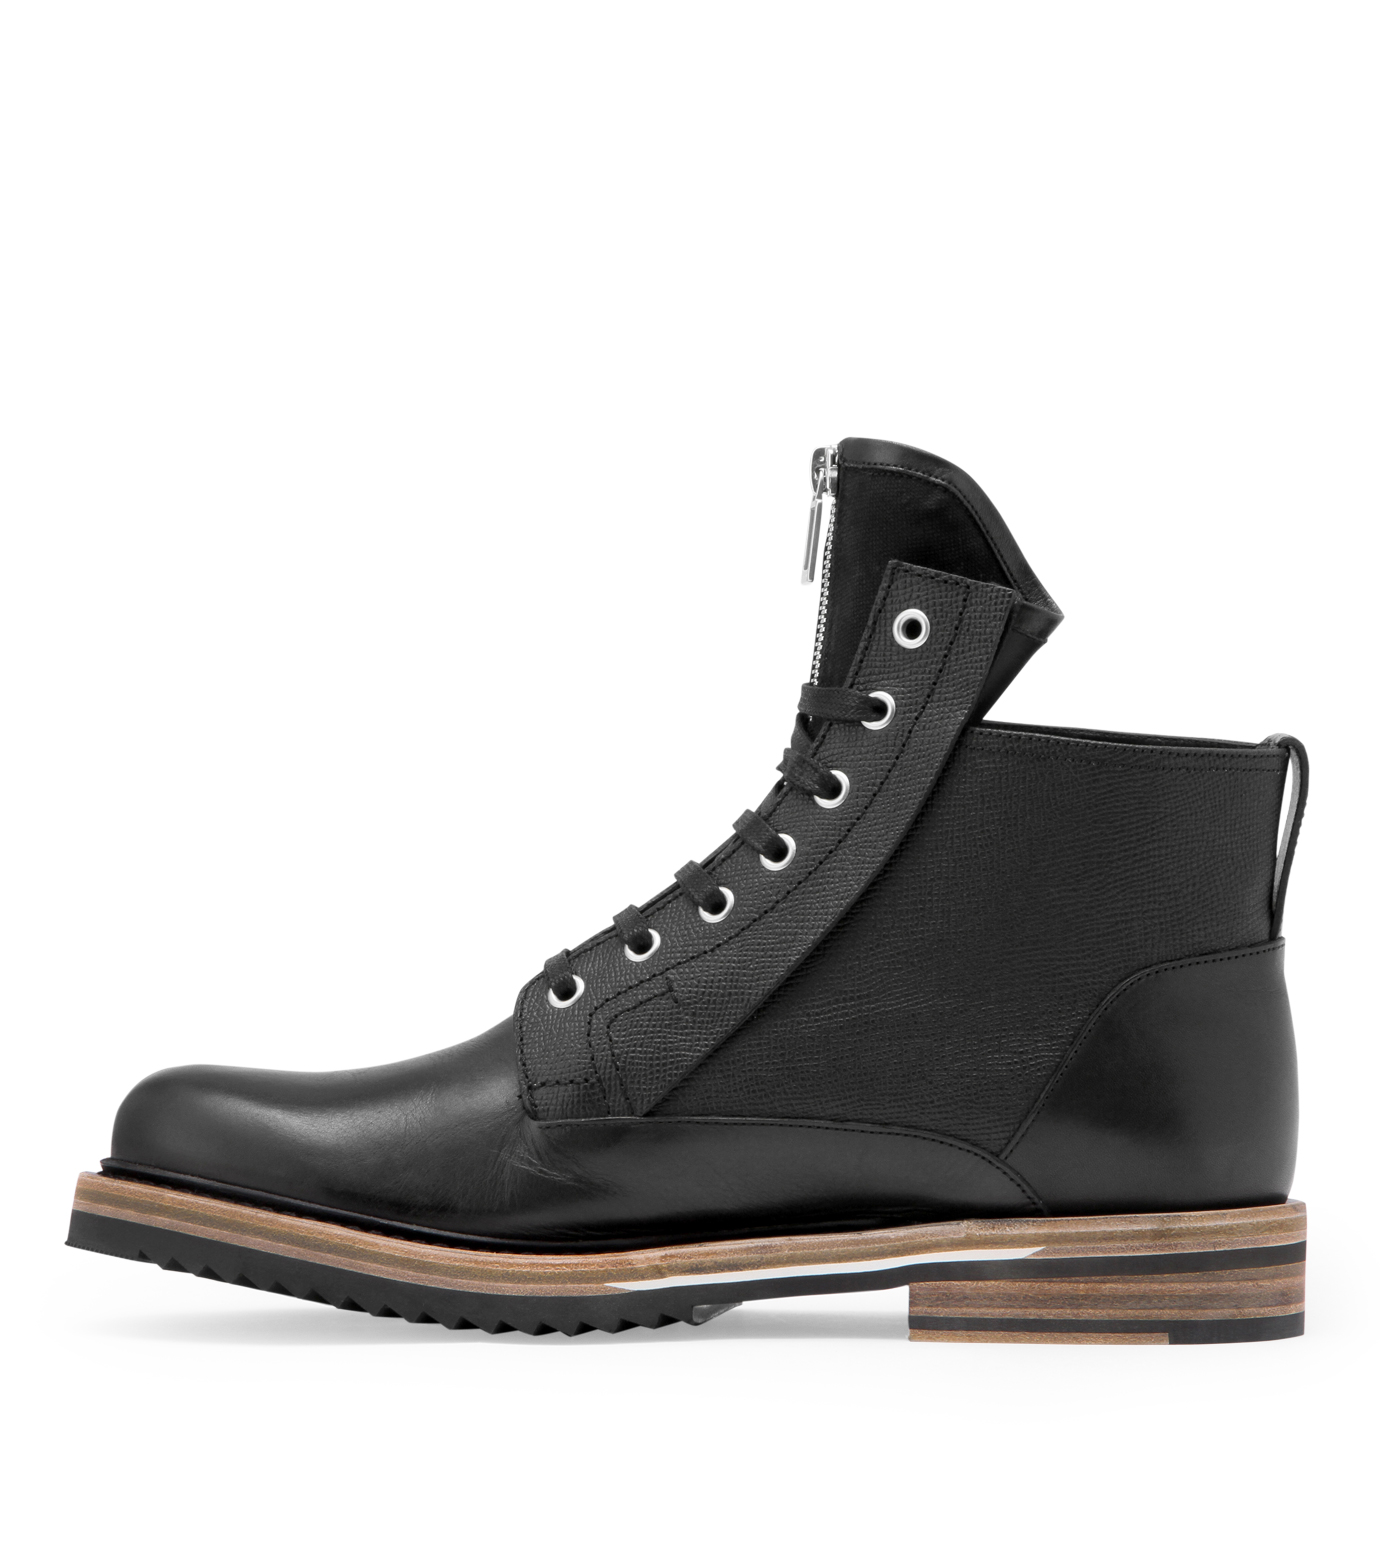 Dior Homme(ディオール オム)のCollection boots-BLACK-3BO080VDZ-13 拡大詳細画像2